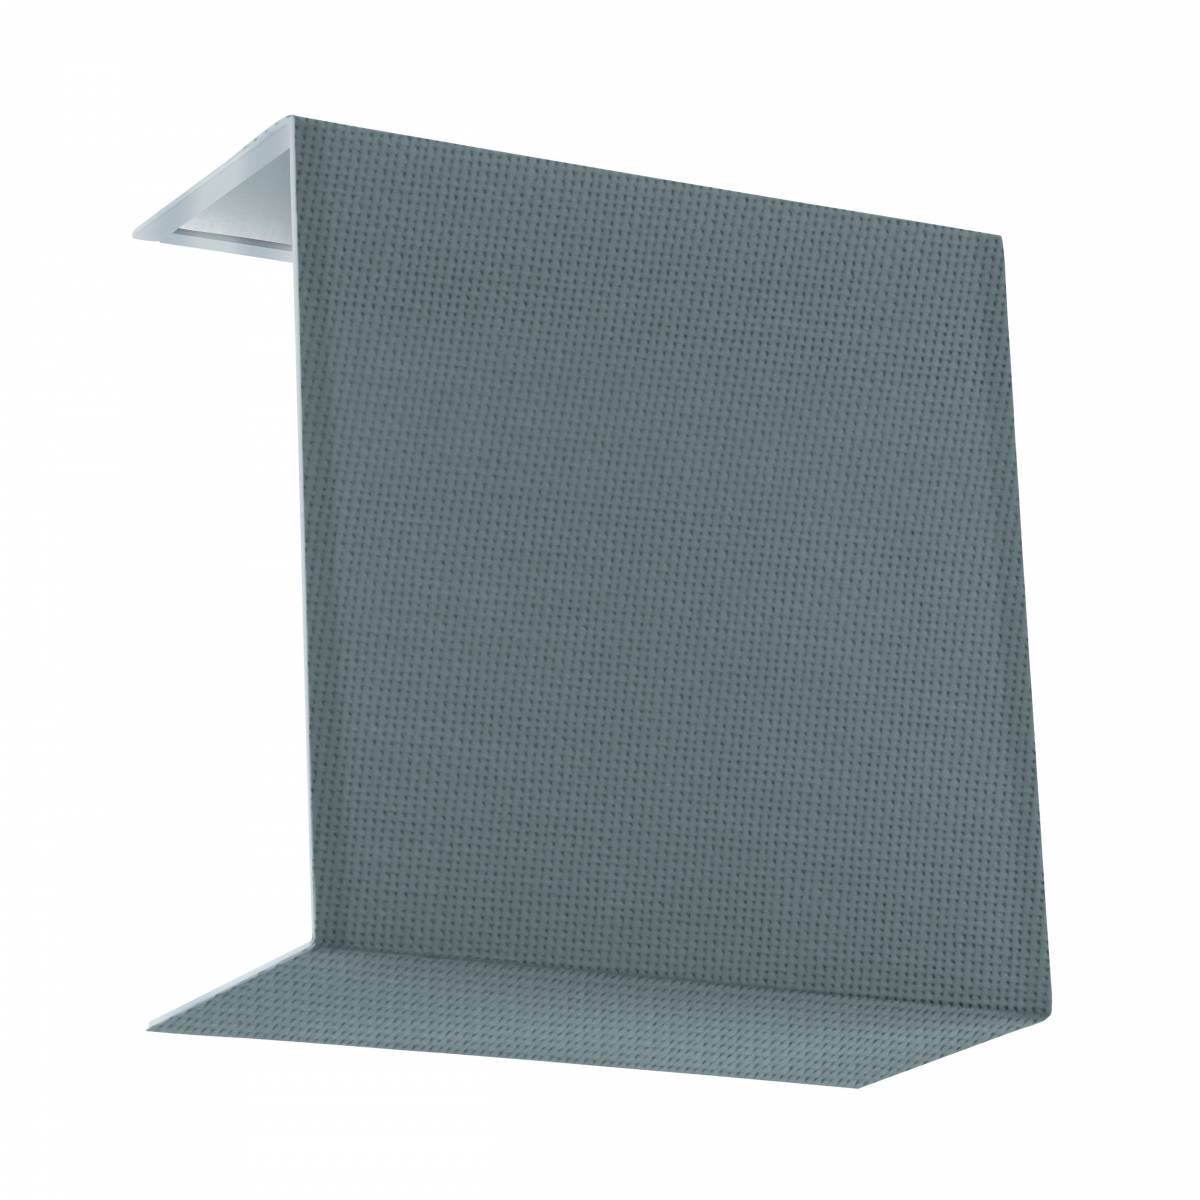 Shade square zu Wall luminaire Pasteri Pro linen grey